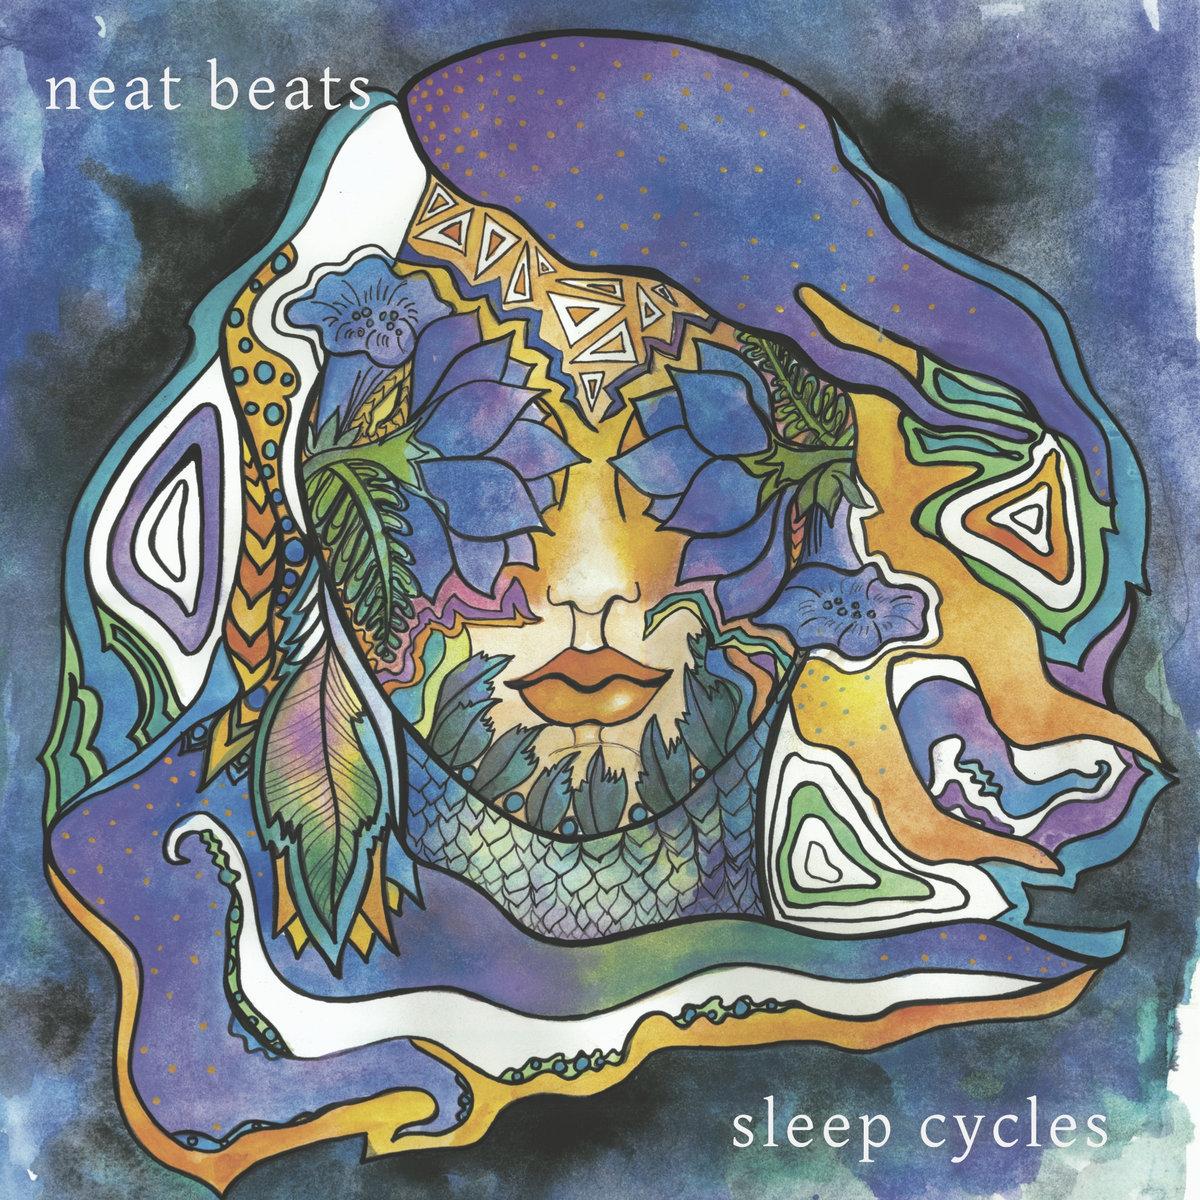 sleep cycles by neat beats